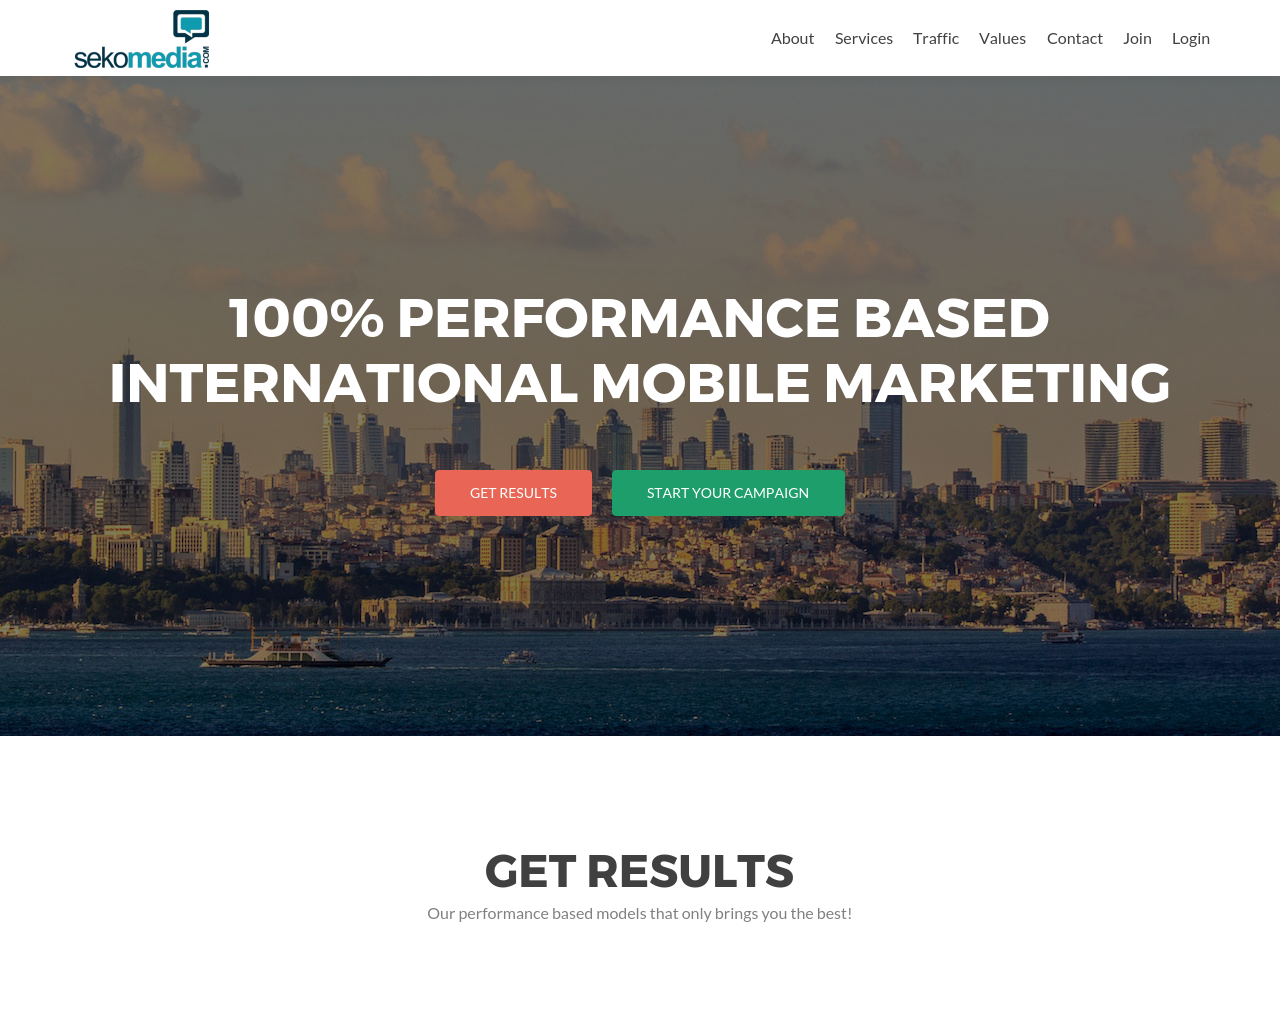 Sekomedia-Advertising-Reviews-Pricing